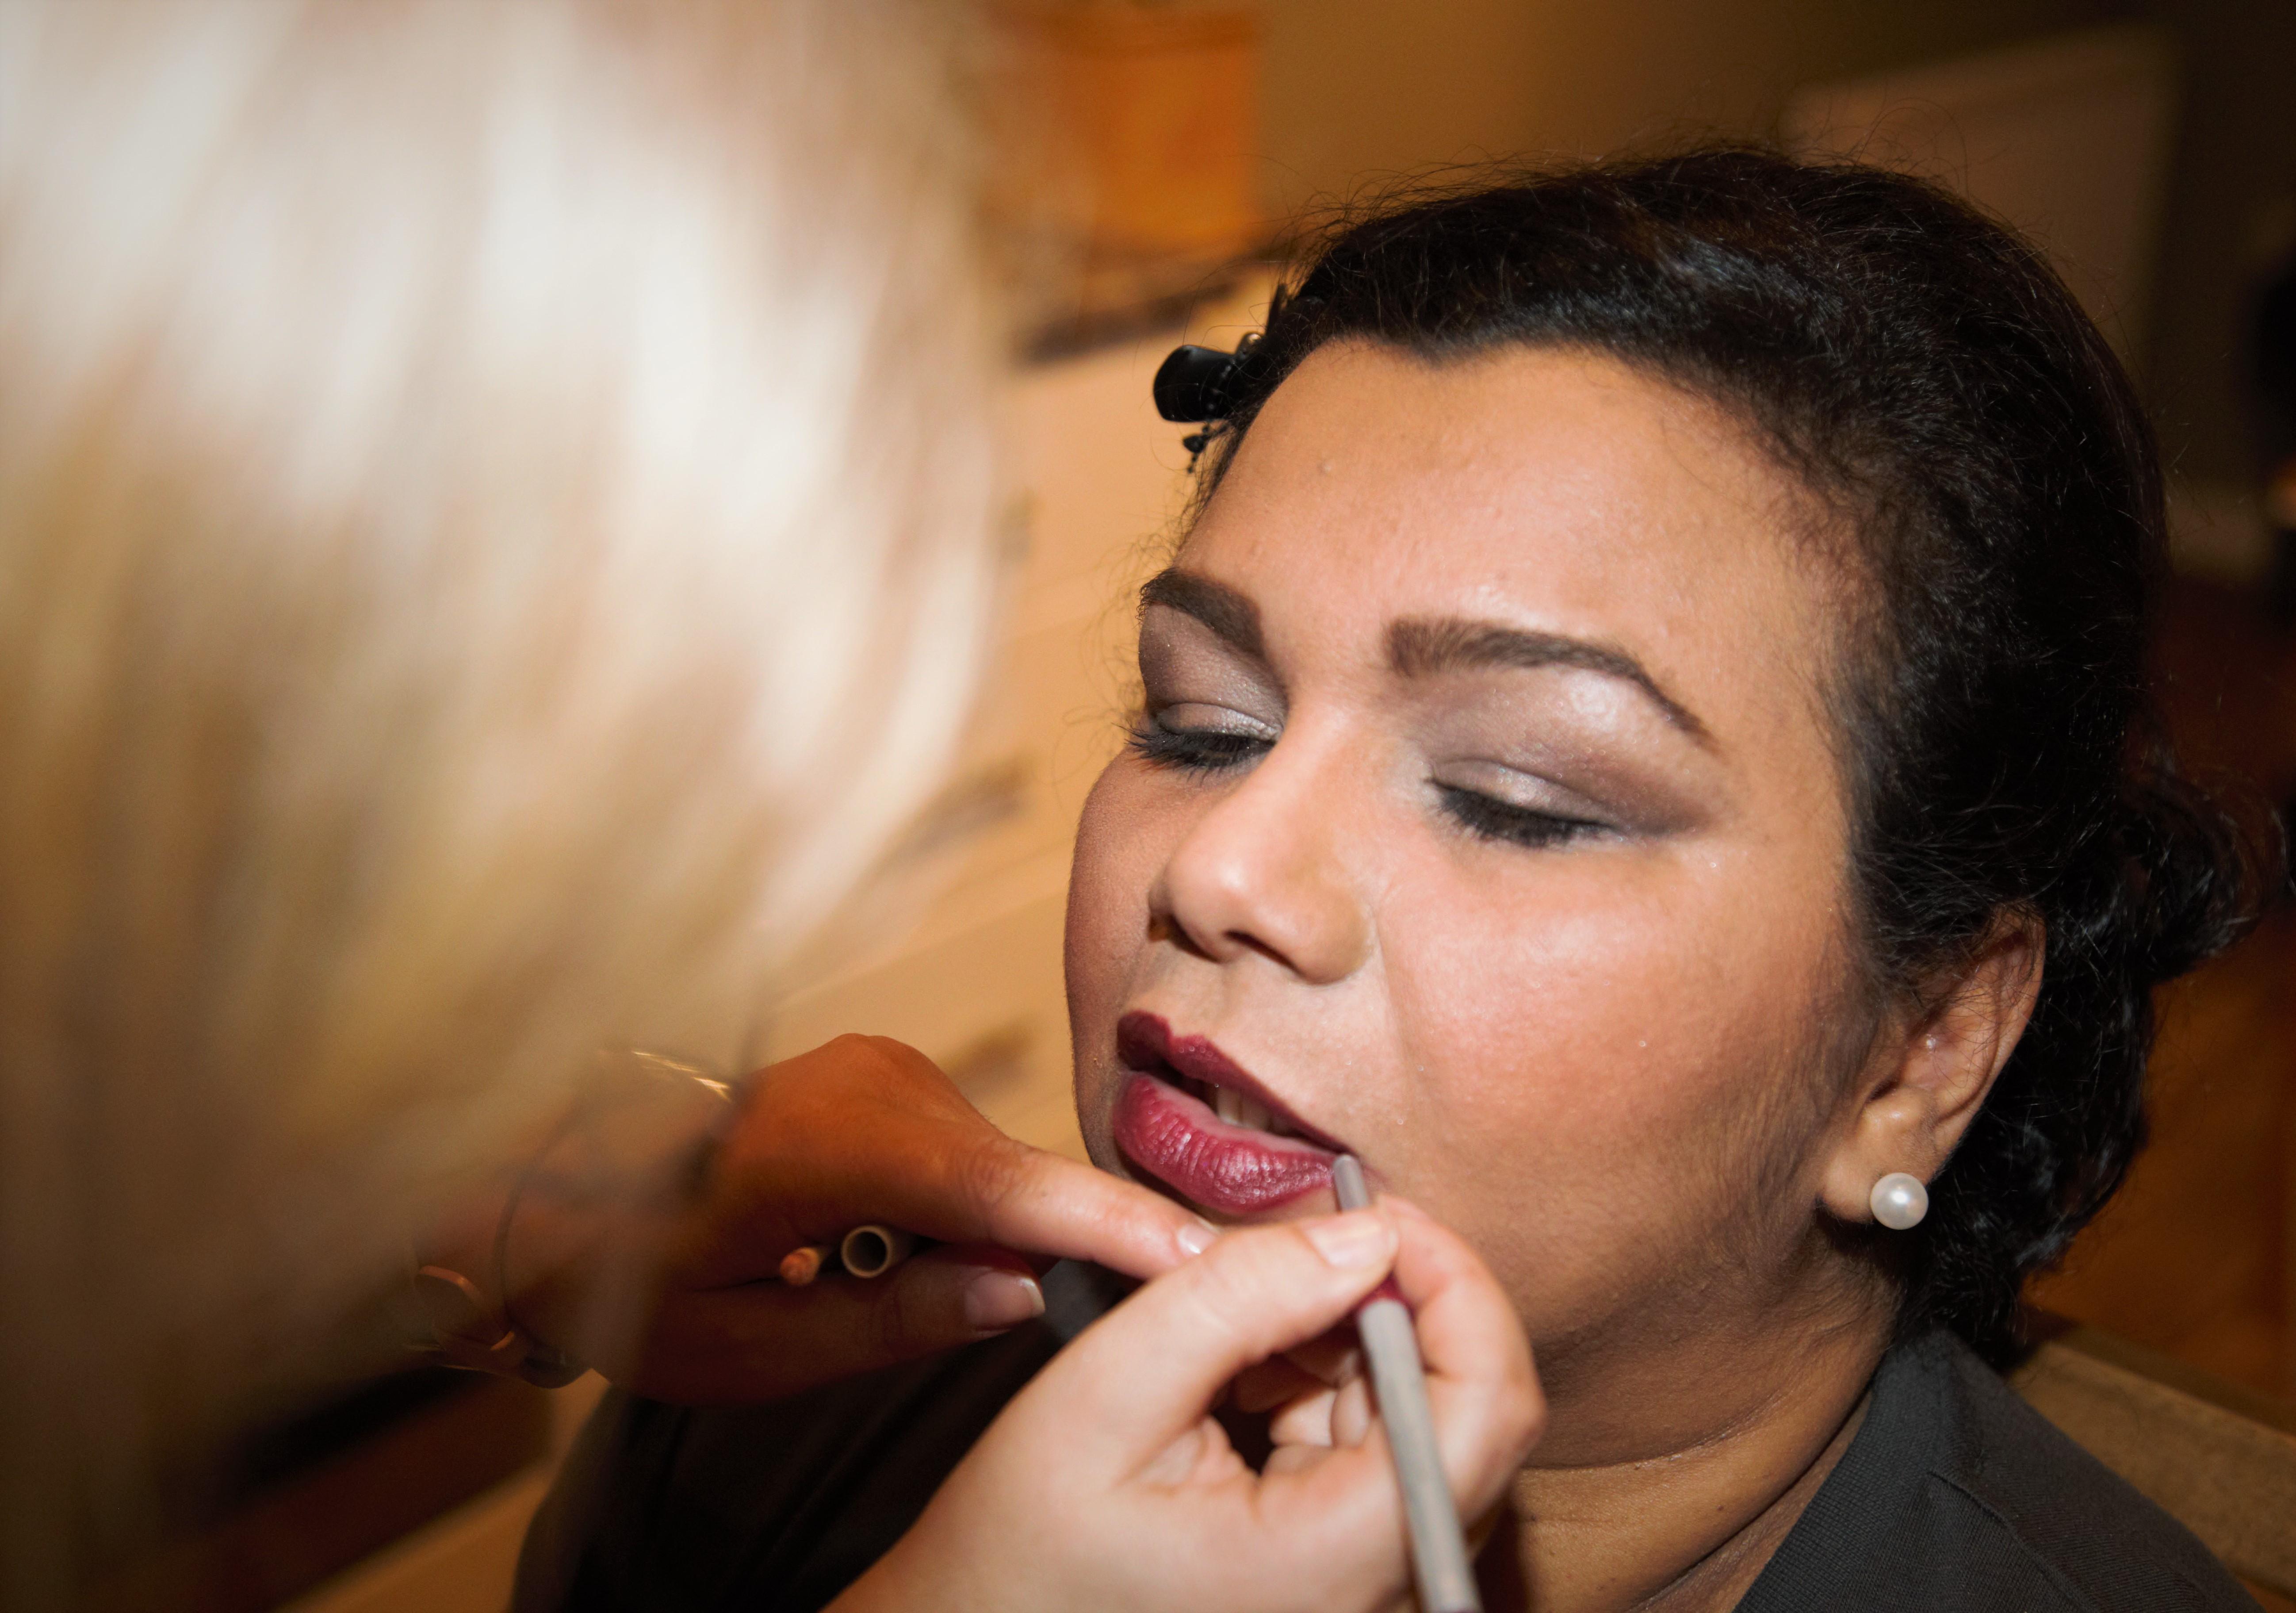 Sandi's make-up artist